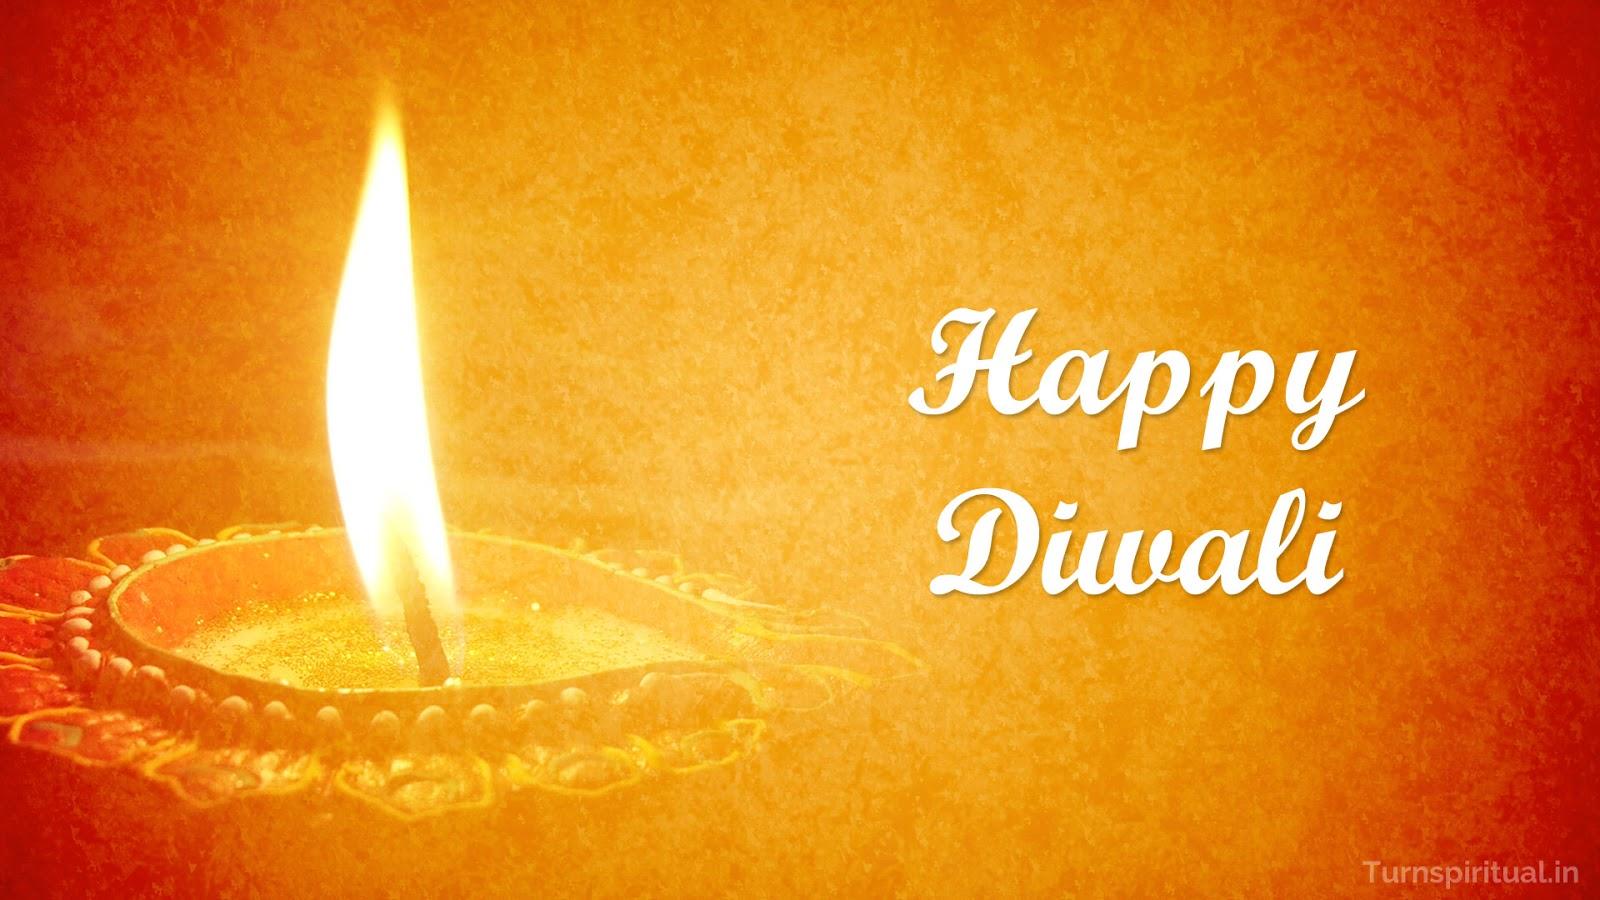 Happy Diwali Greeting Cards In Punjabi Get The Latest Happy Diwali